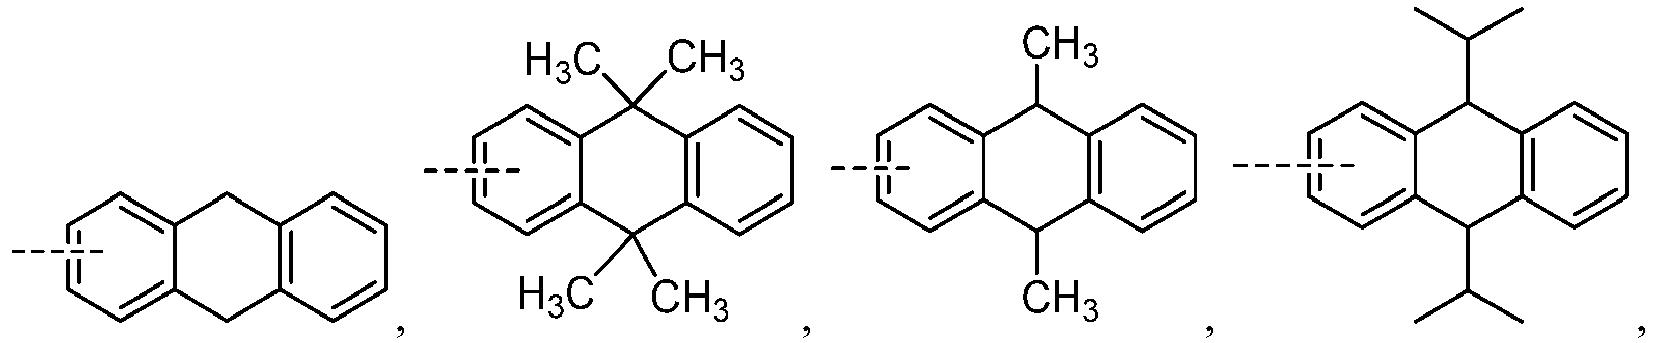 Figure imgb0313